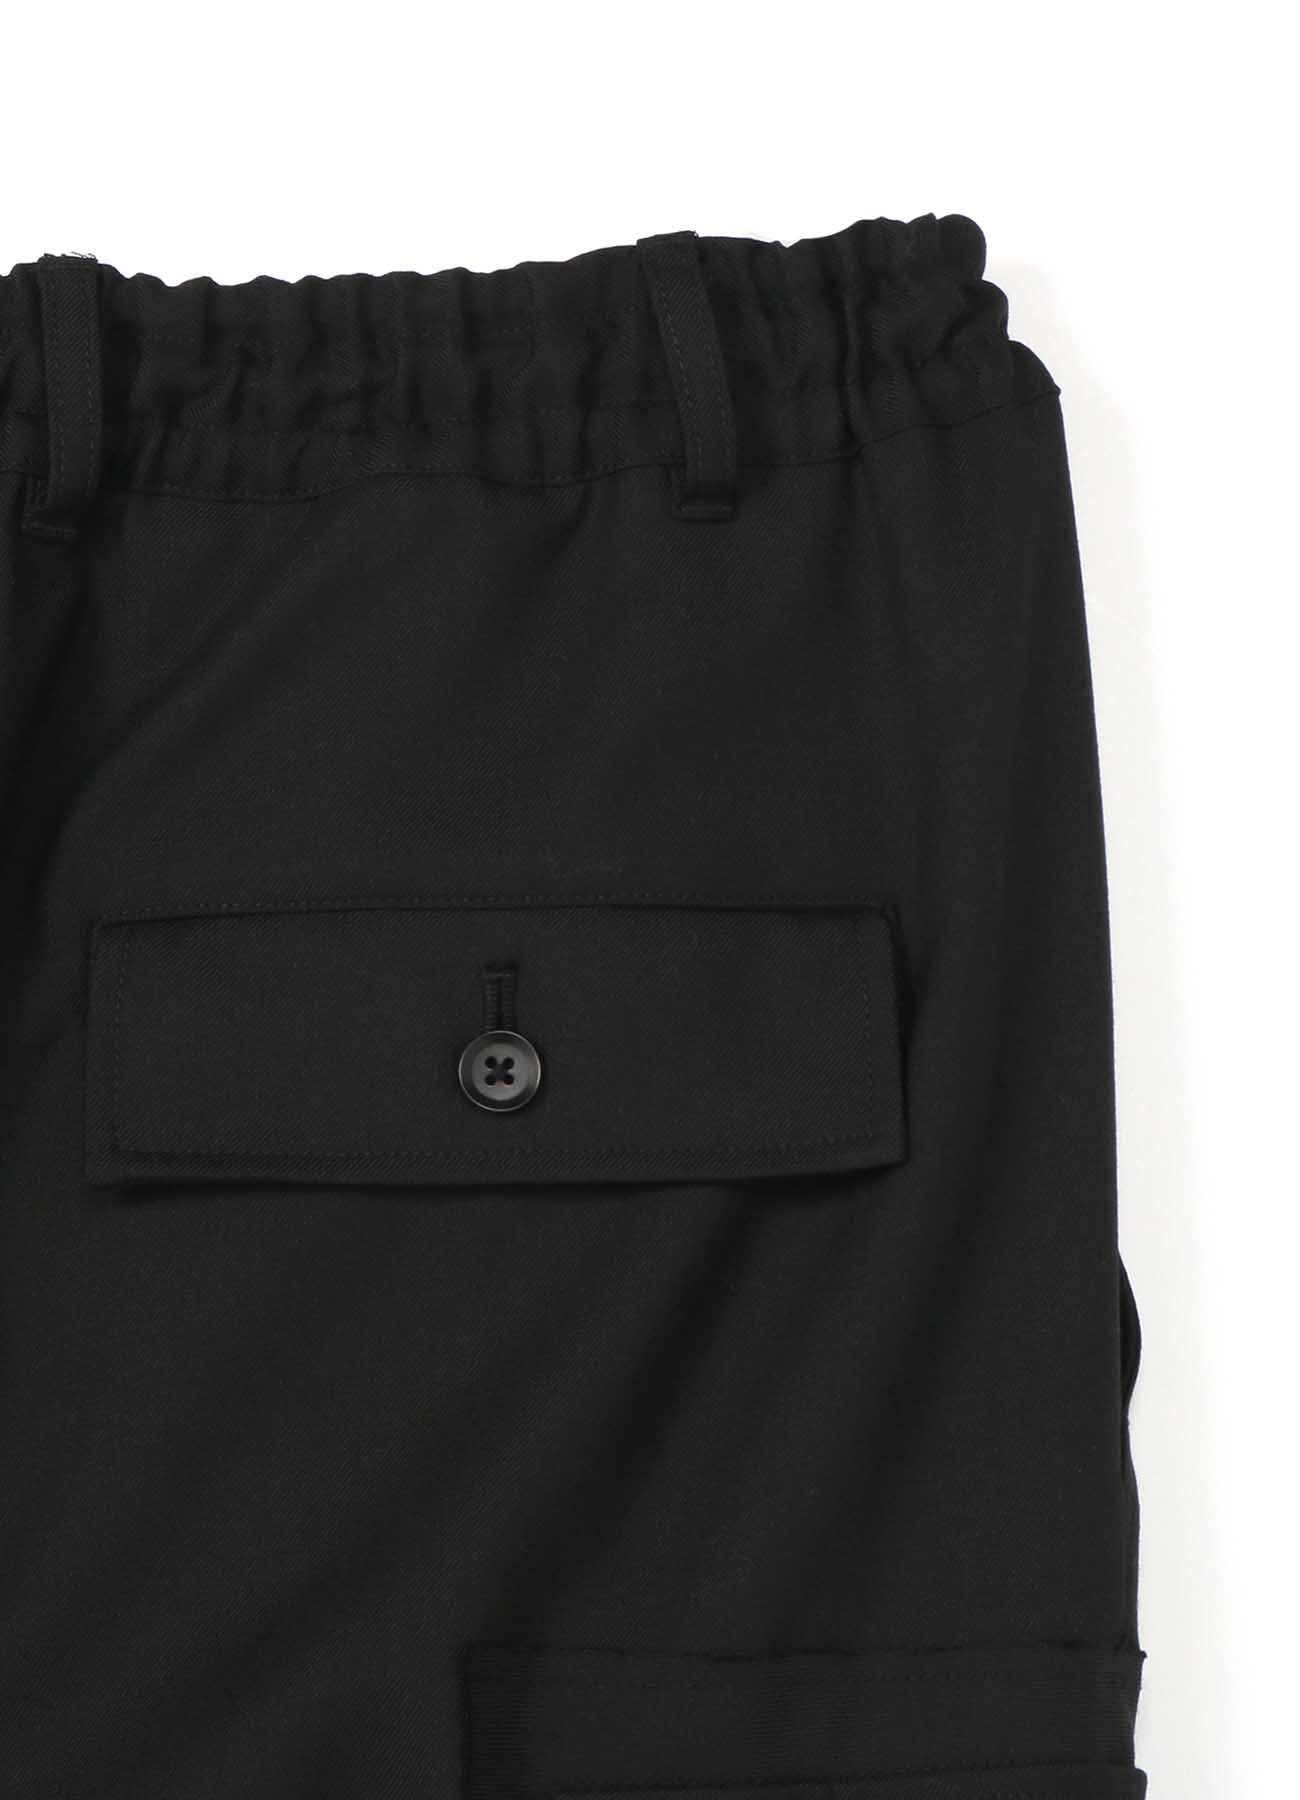 T/W Gabardine Military Cargo Pants